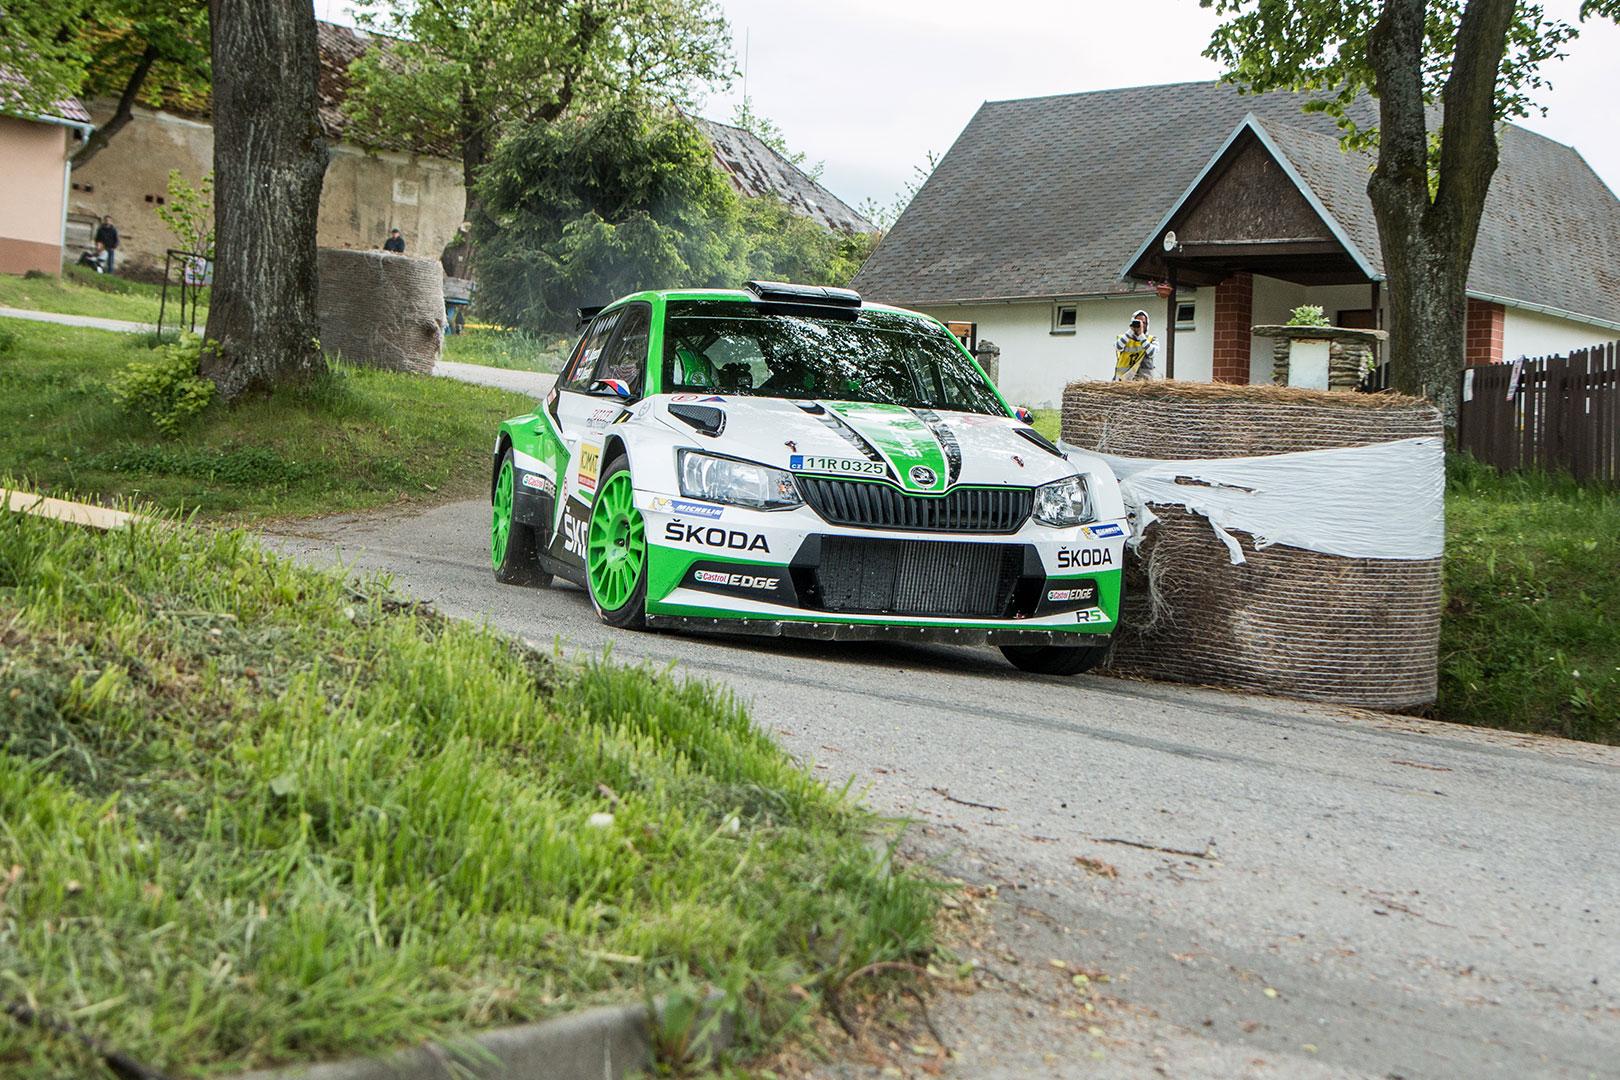 Rallye Český Krumlov Starts This Friday